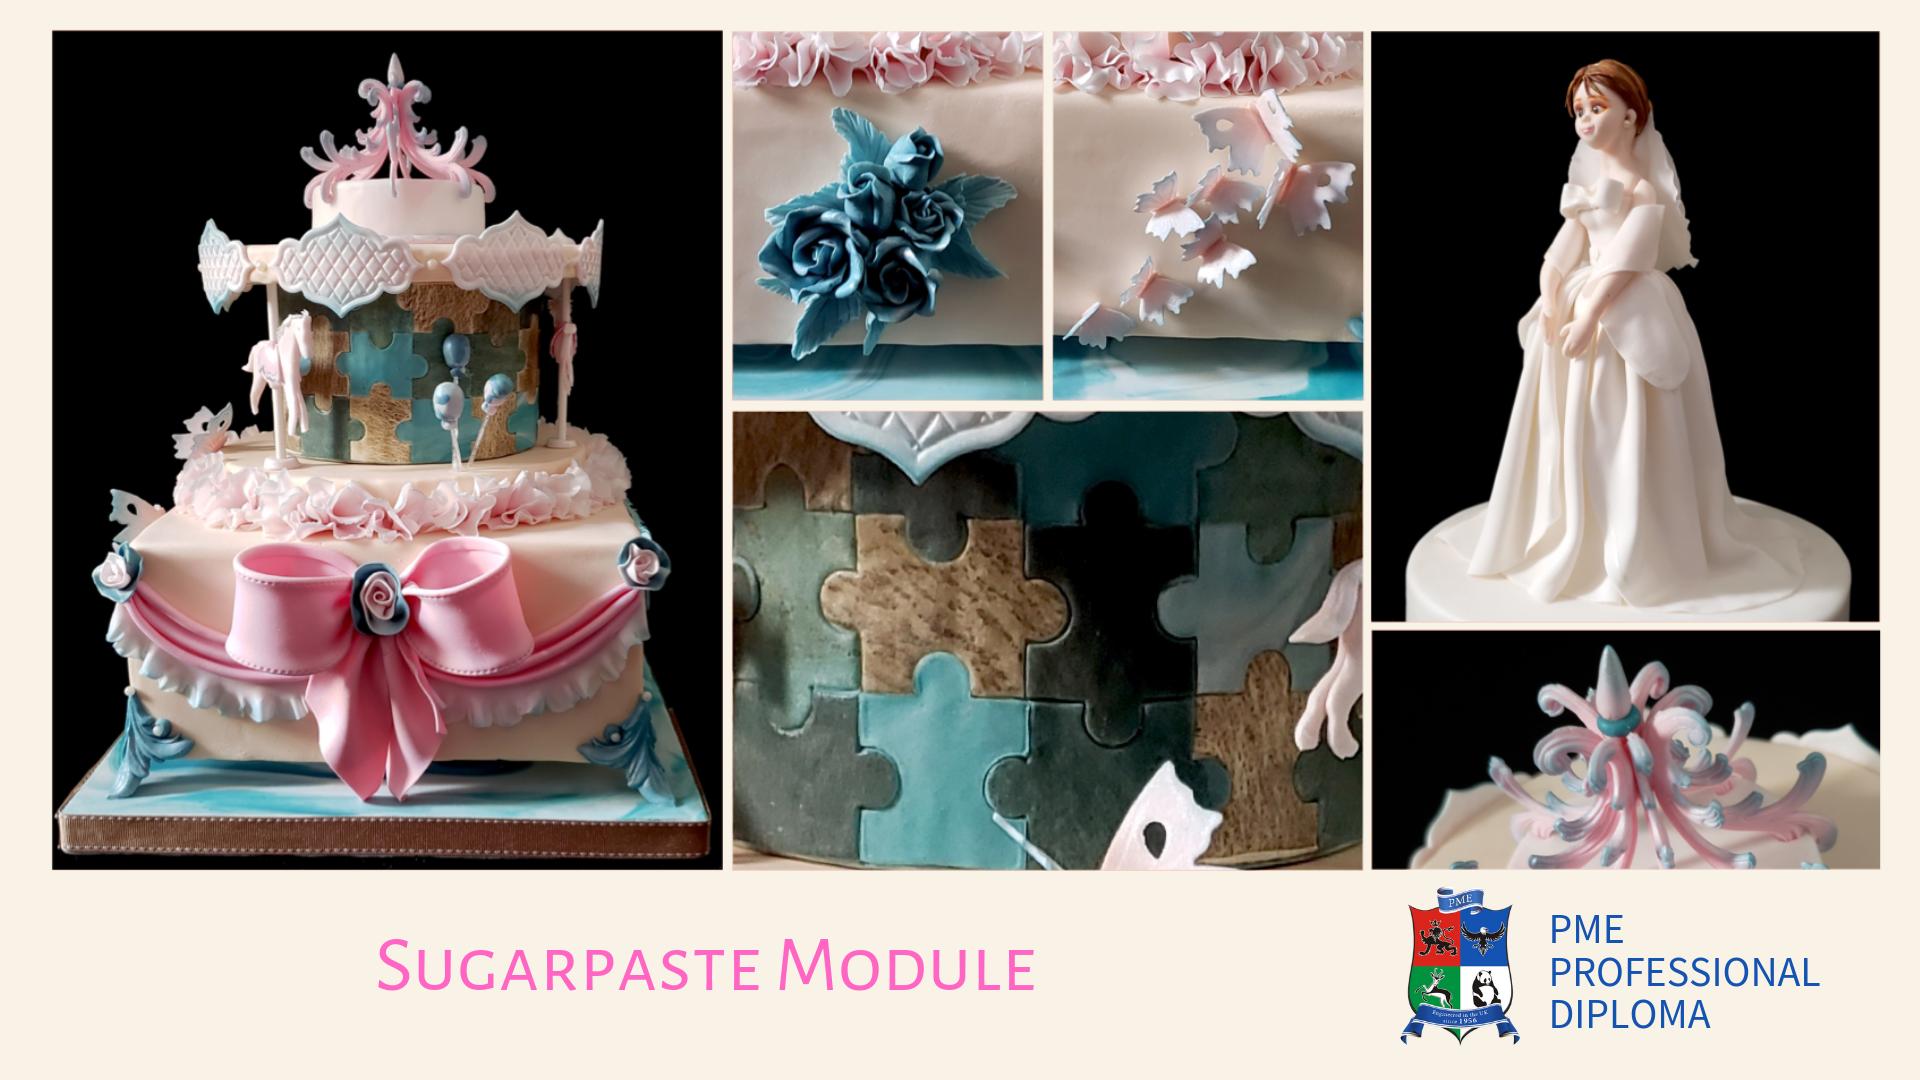 PME Diploma Course - Sugarpaste Module